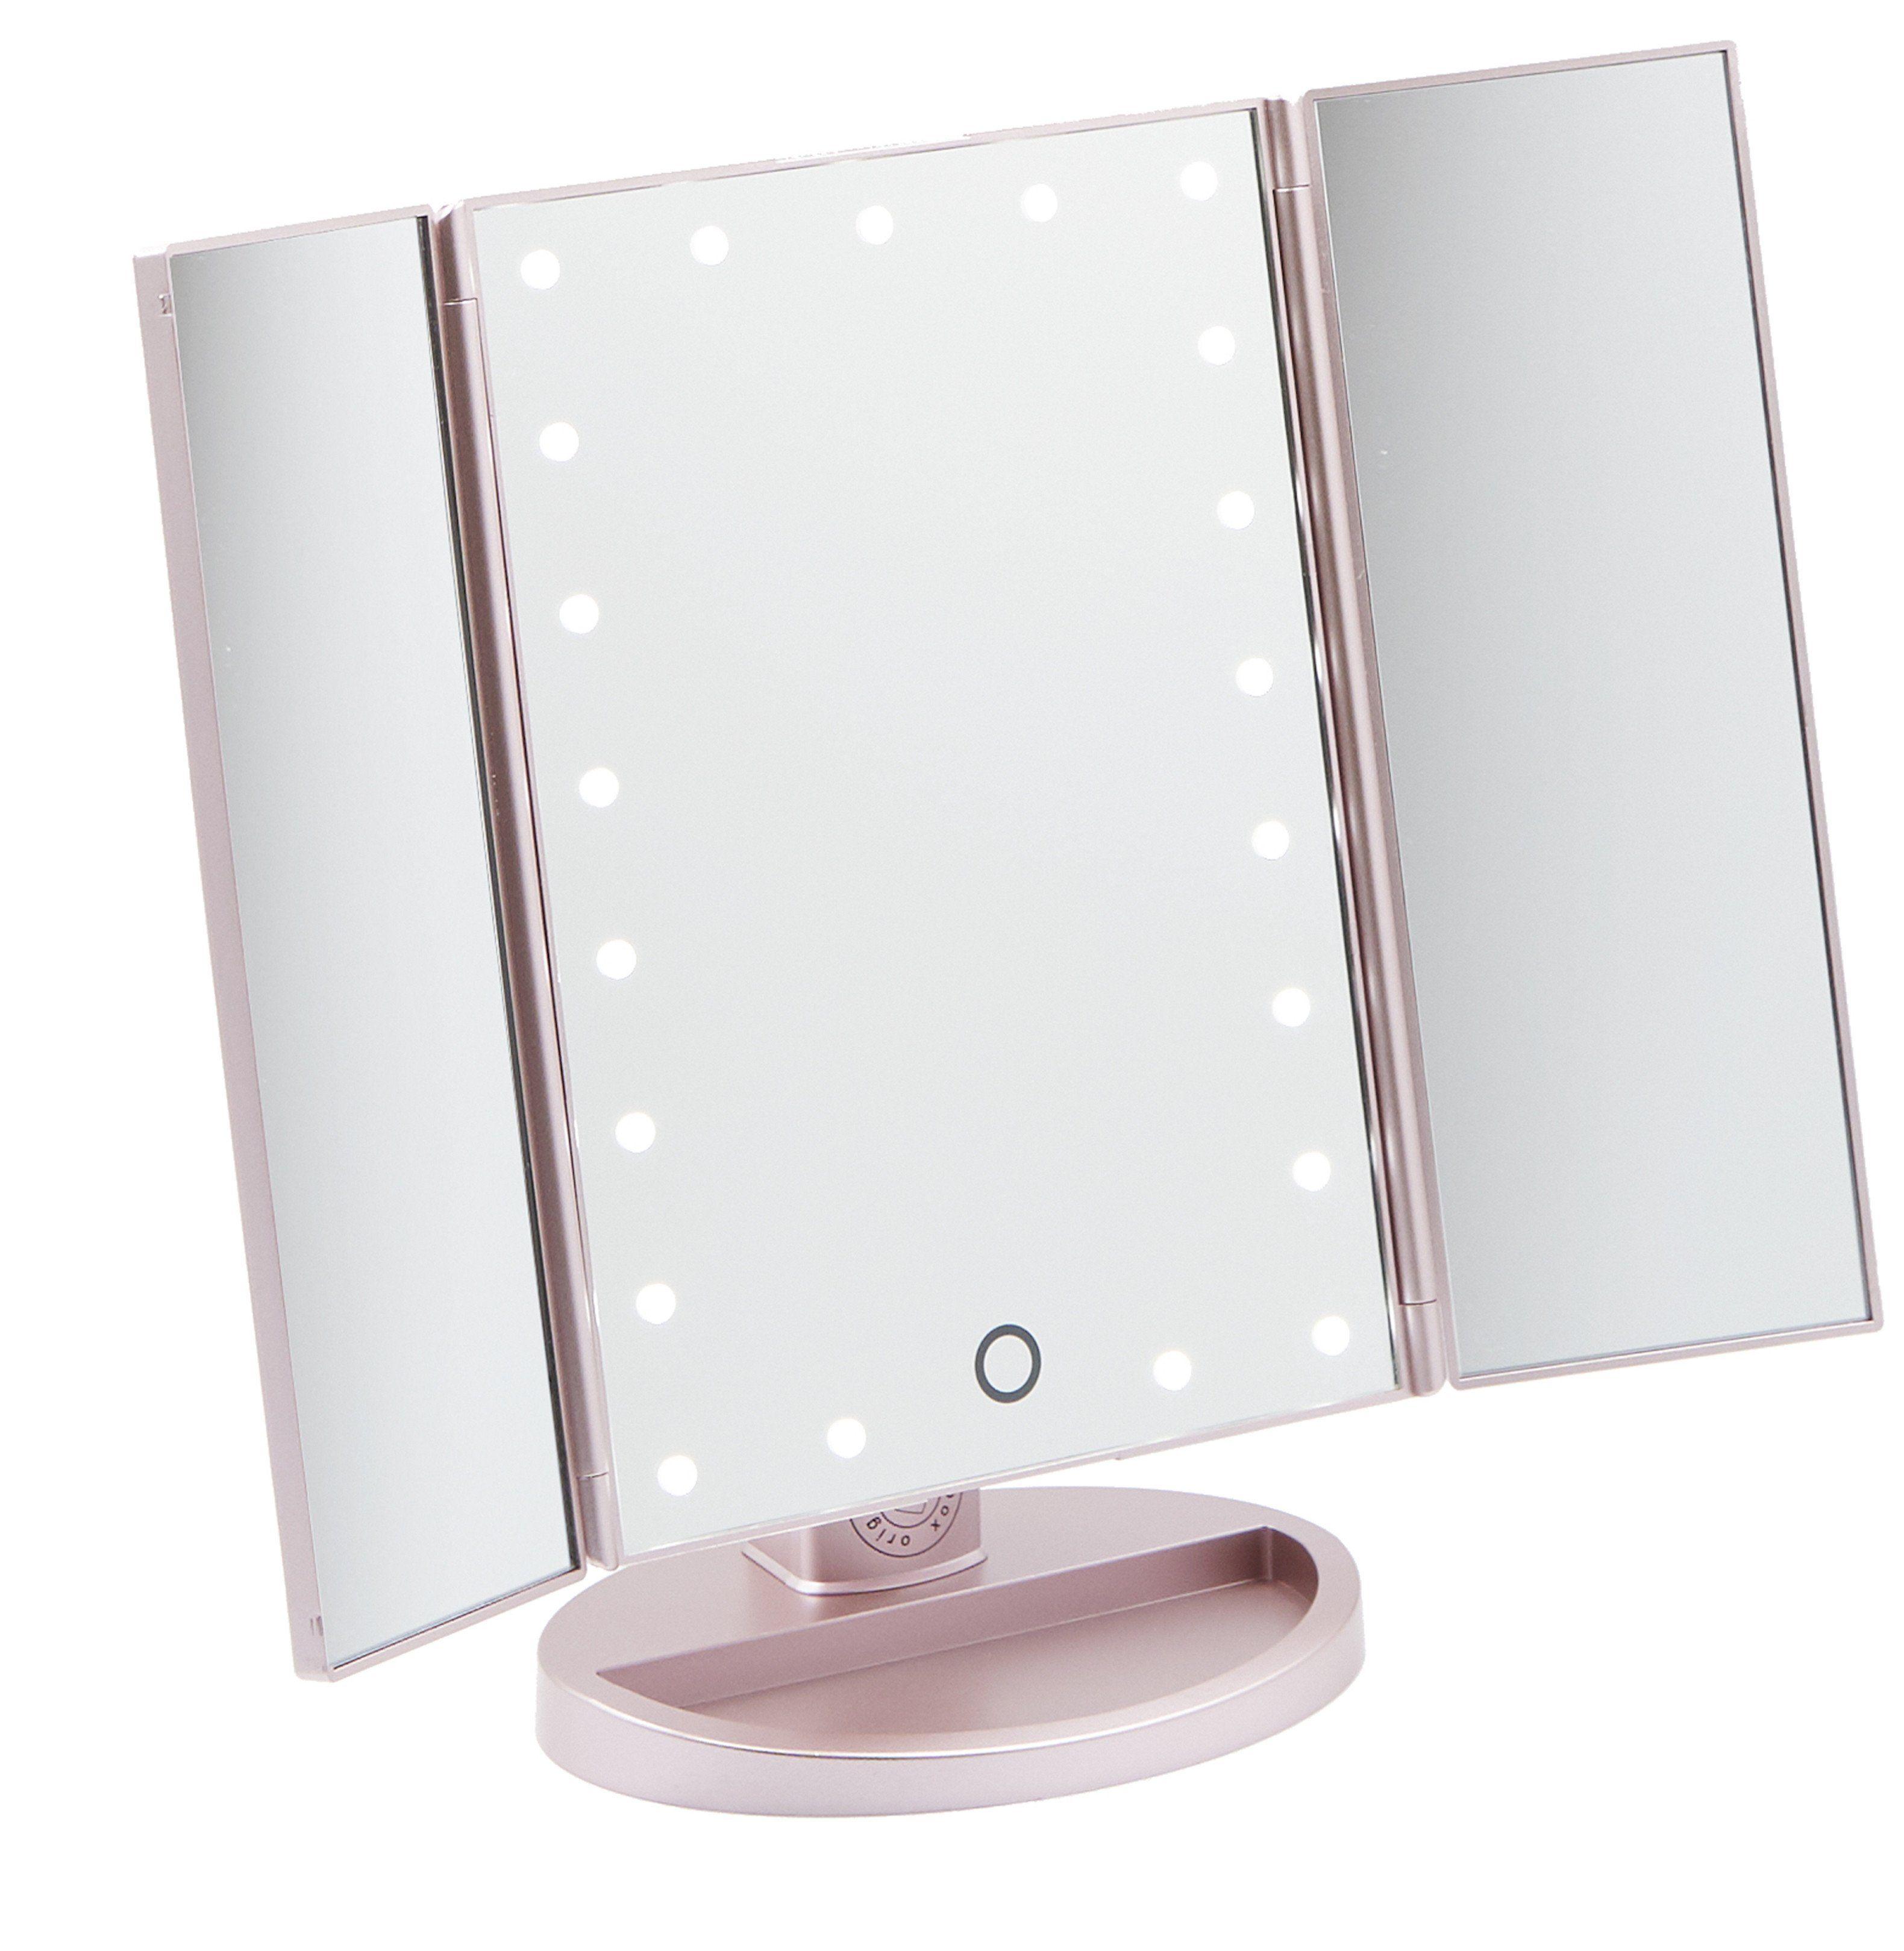 Original Beauty Box Rose Gold Three Way Vanity Mirror